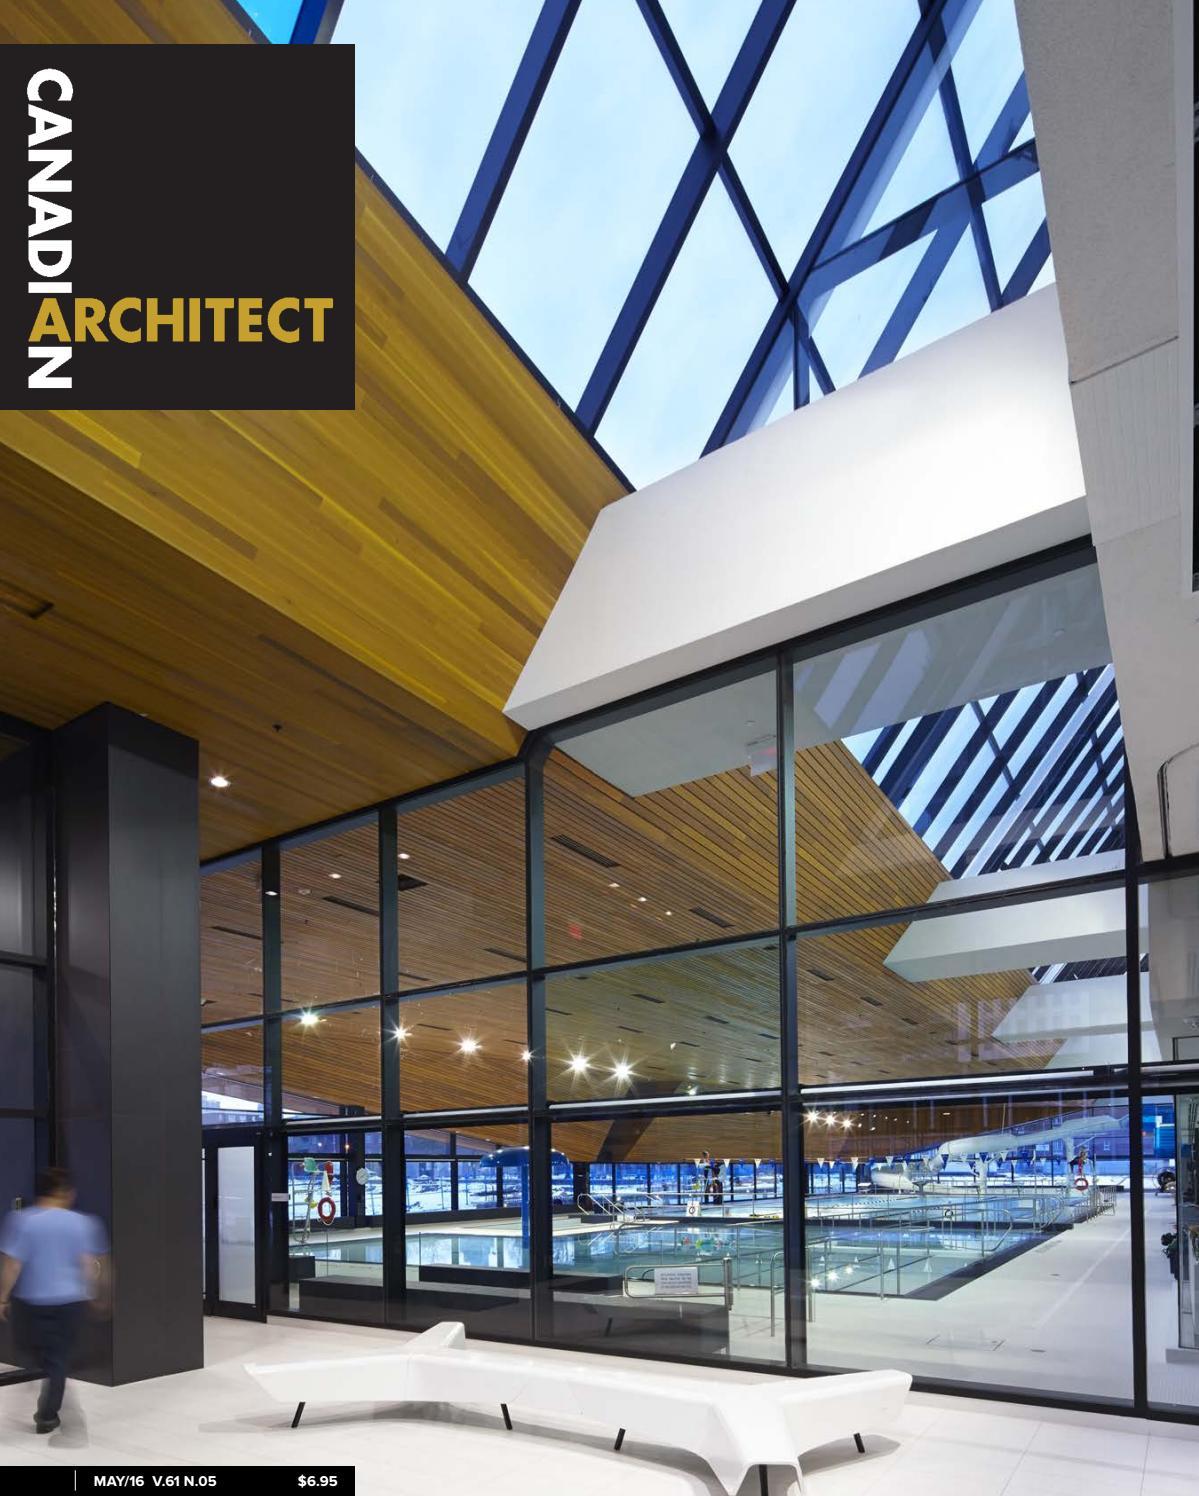 Construction Hangar Bois Prix canadian architect may 2016iq business media - issuu